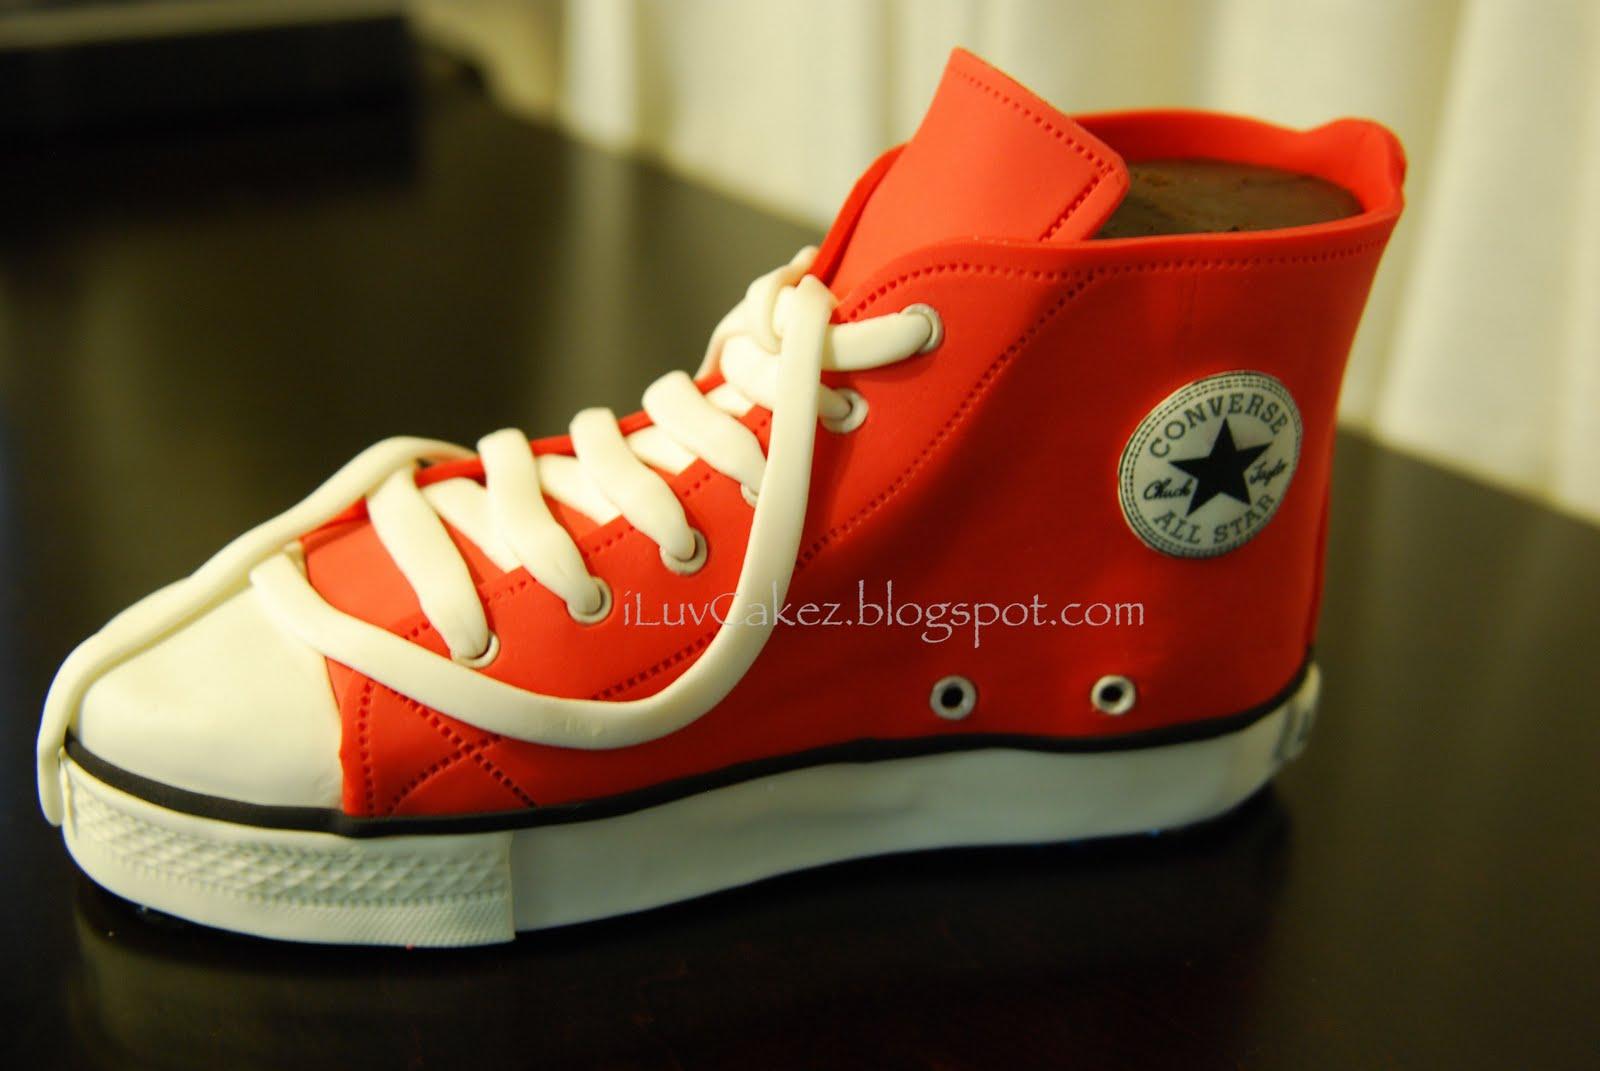 Iluv Cakez Converse Shoe Cake Dea S 12th Birthday